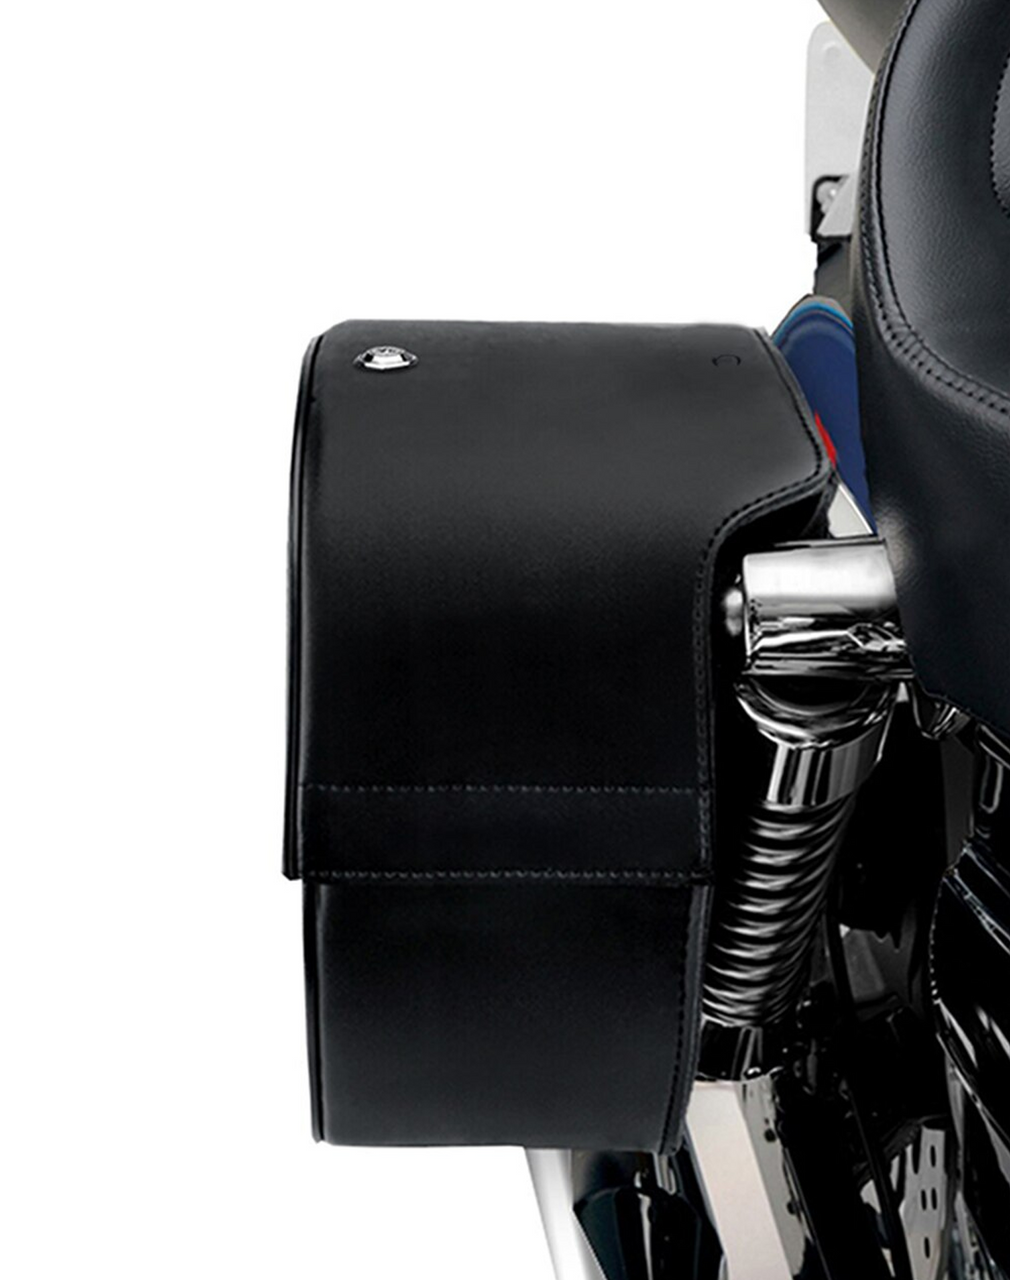 Triumph Rocket III Range Viking Shock Cutout Single Strap Large Slanted Leather Motorcycle Saddlebags Shock Cutout View